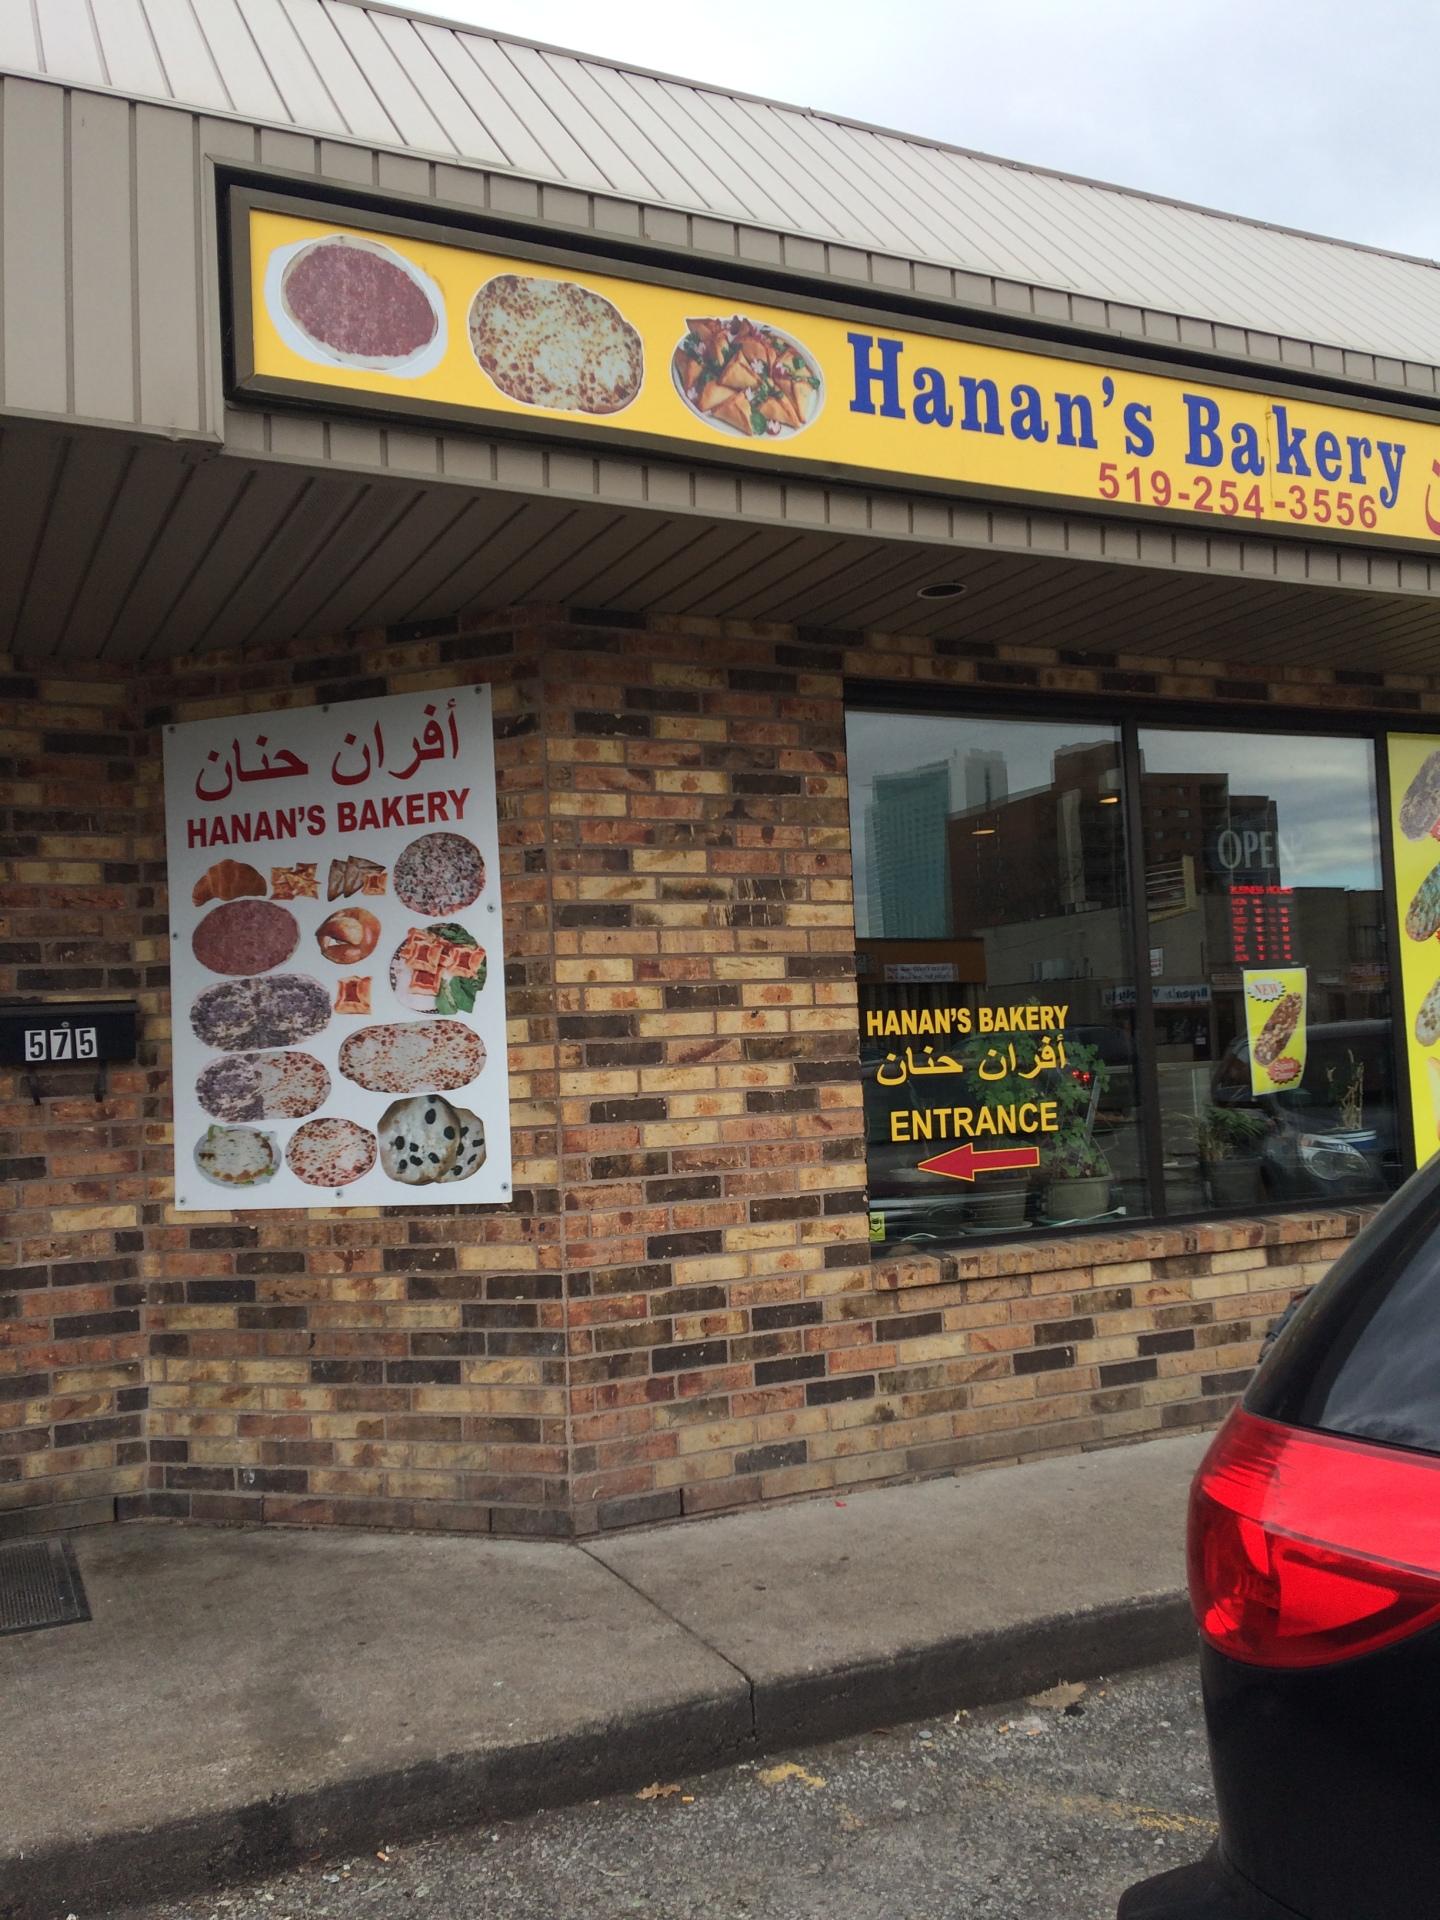 Hanan's Bakery